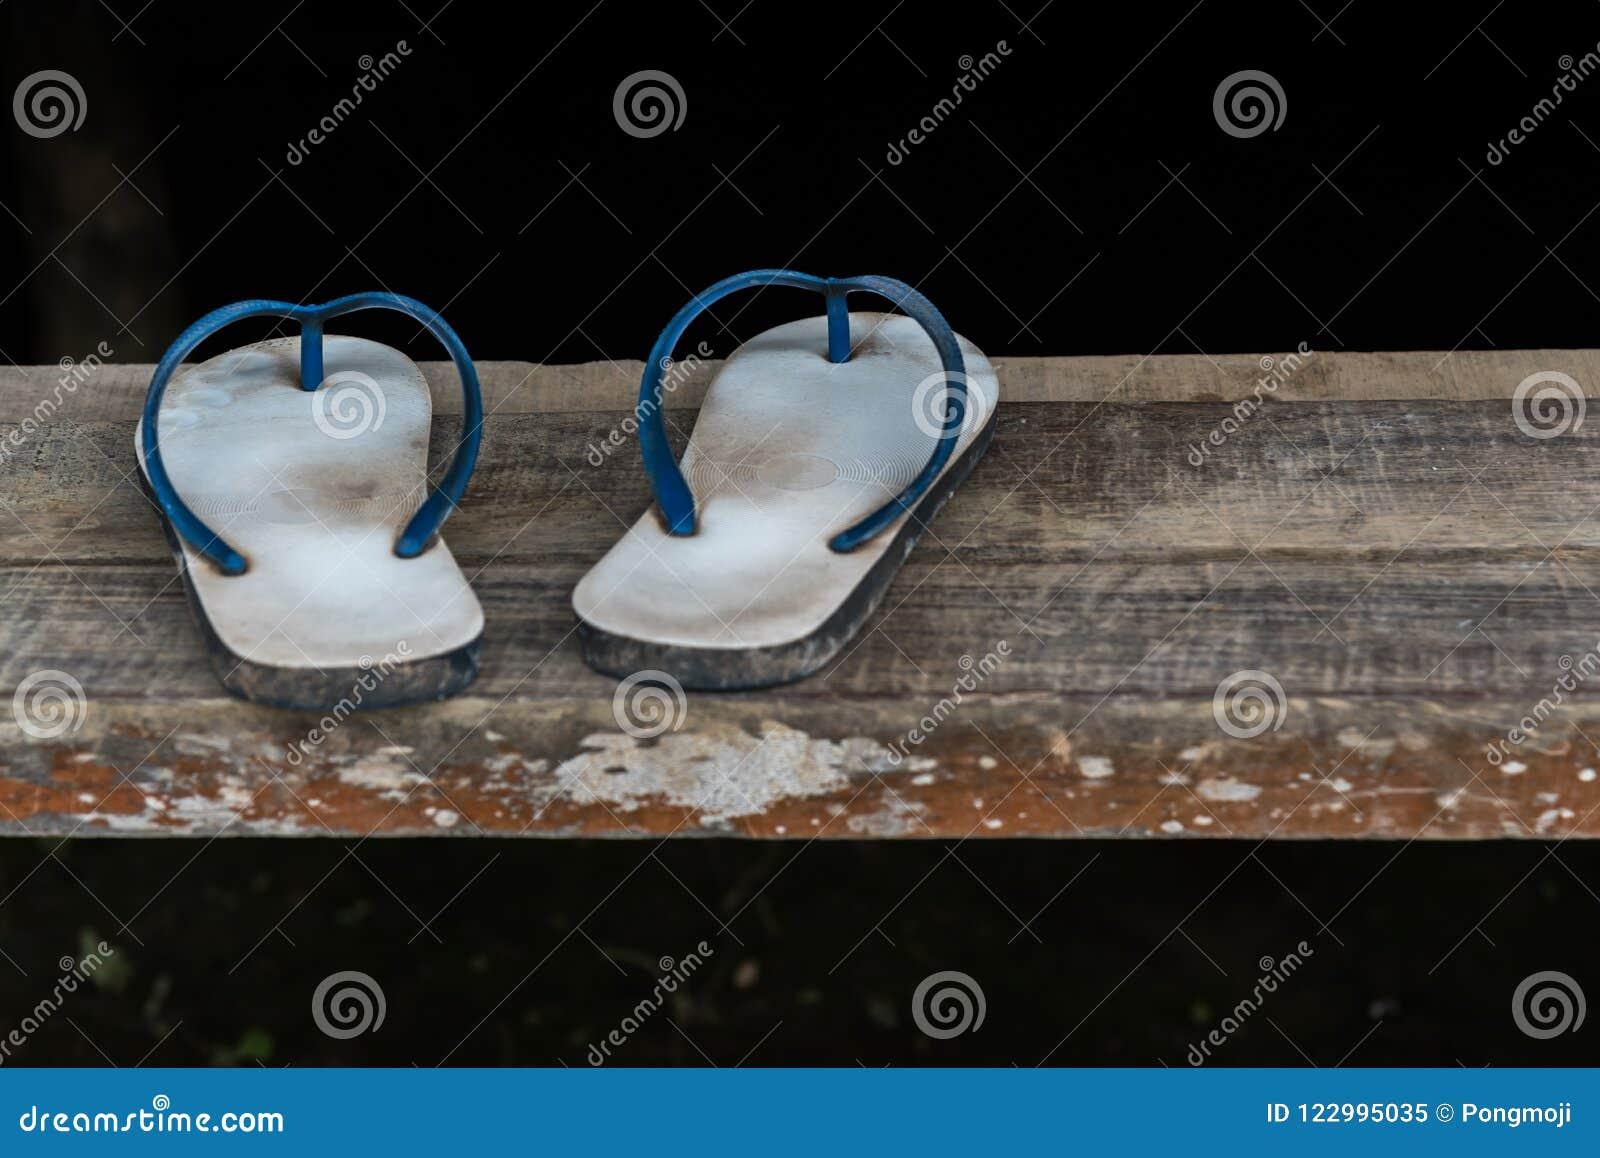 0614c2234 Vintage sandal or thongs or flip-flop blue color is a footwear on wooden  staircase or floor